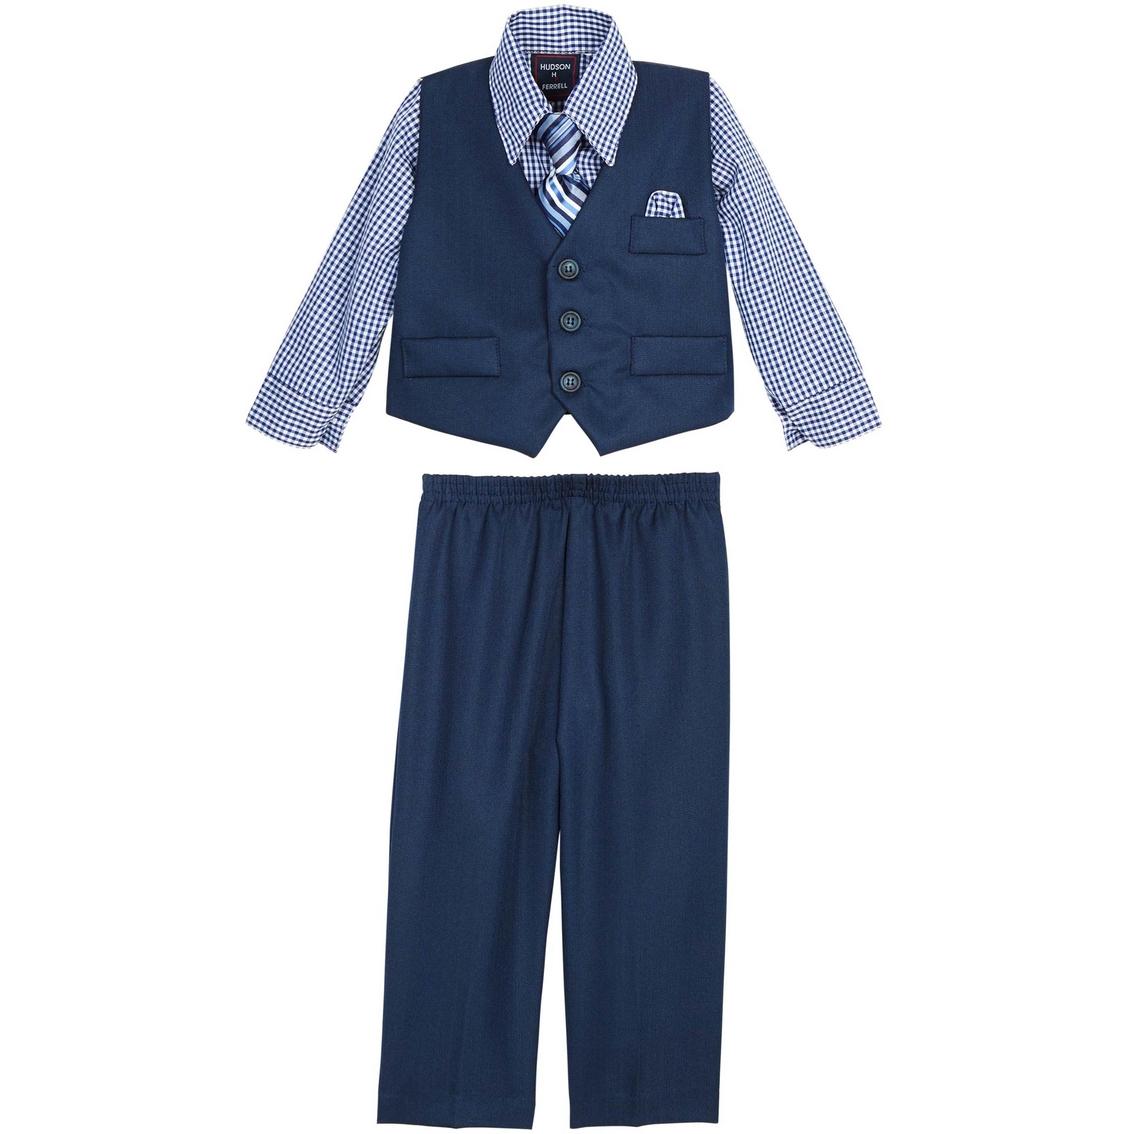 6616a3e8c Hudson Ferrell Infant Boys Dino Navy 4 Pc. Vest Set